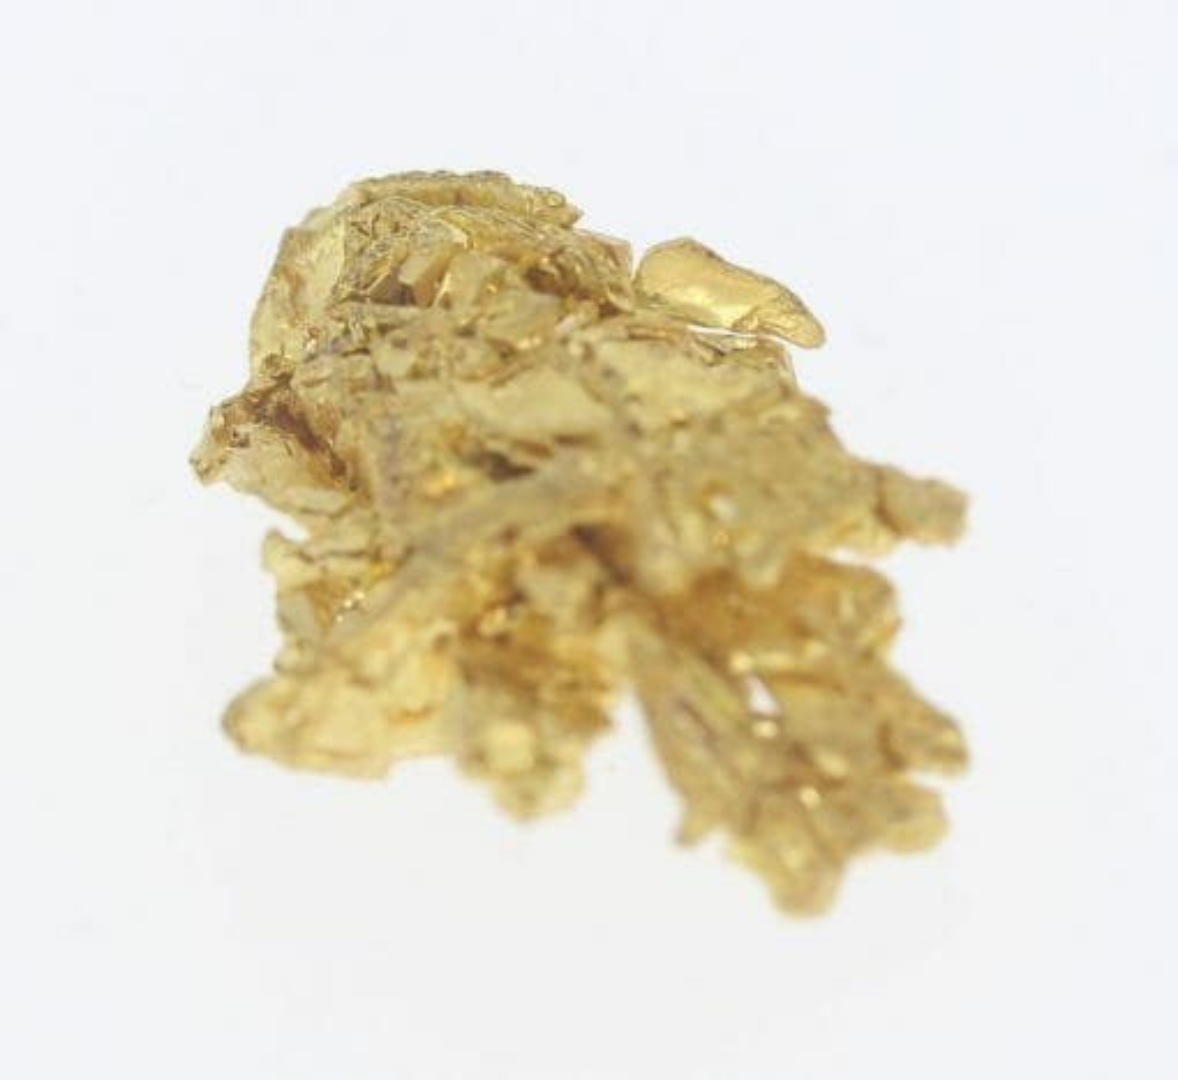 Natural Western Australian Gold Nugget - Crystalline Gold - 3.33g 6